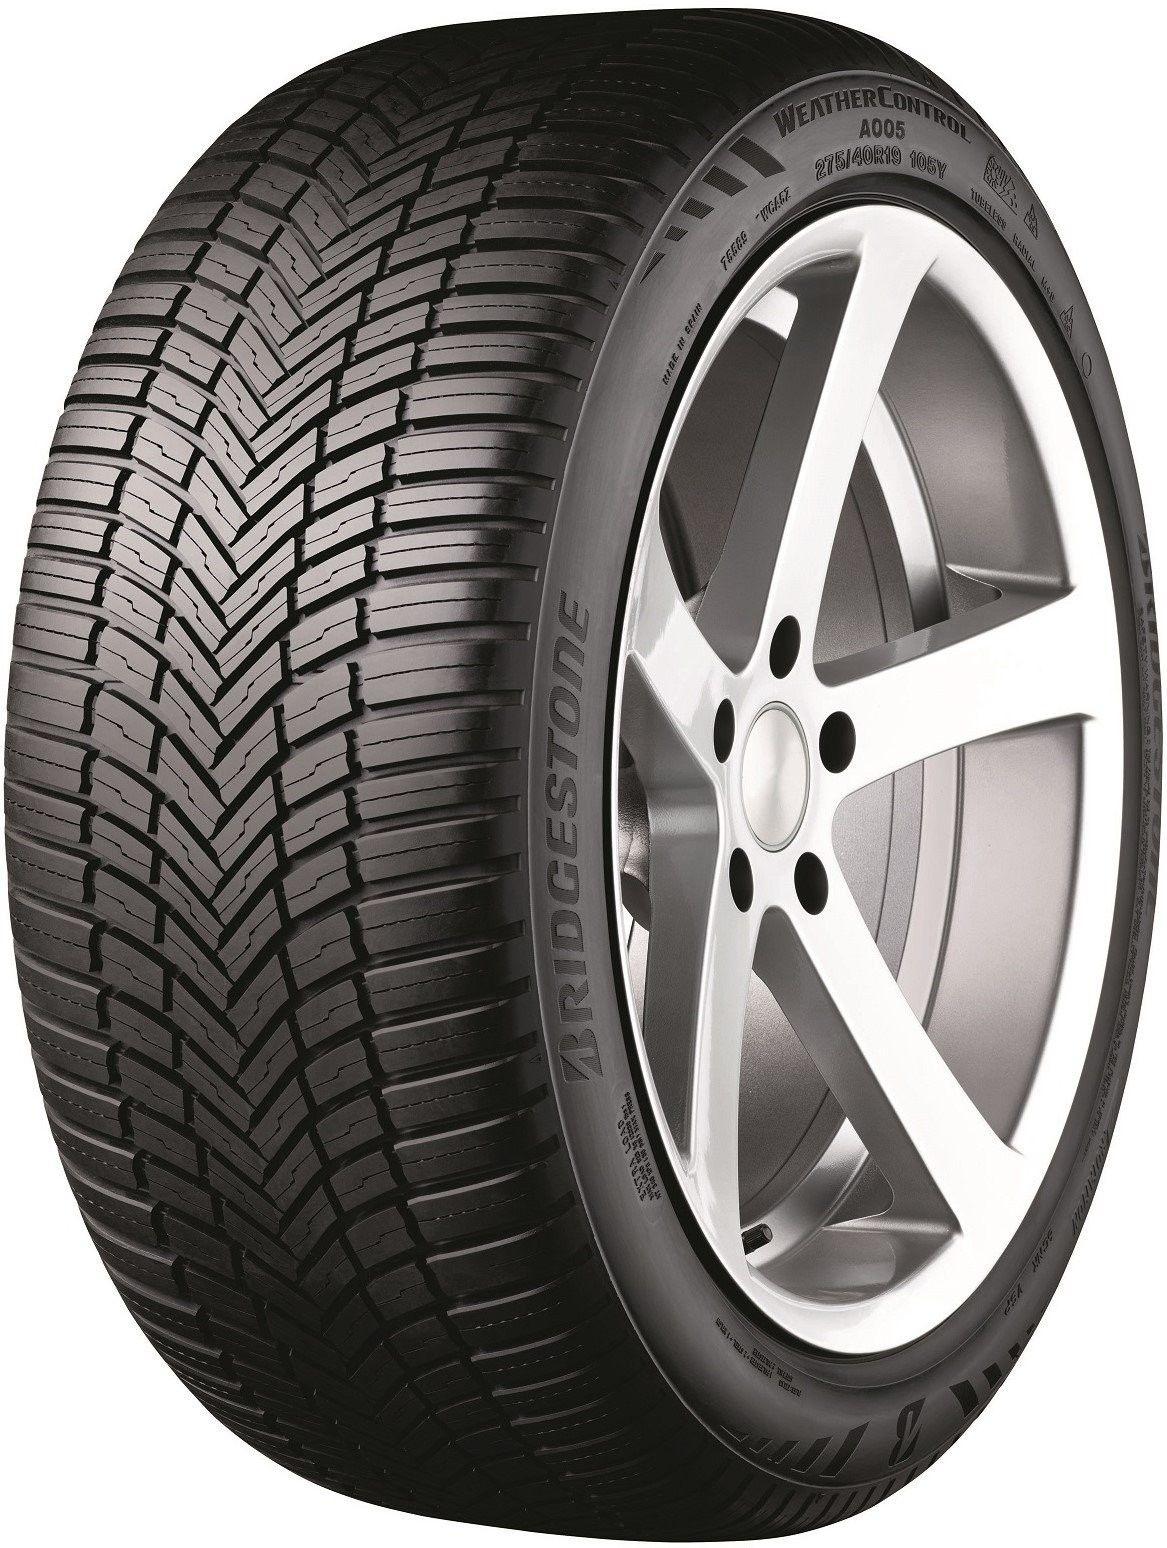 Bridgestone A005 WEATHER CONTROL 215/50 R17 95 W